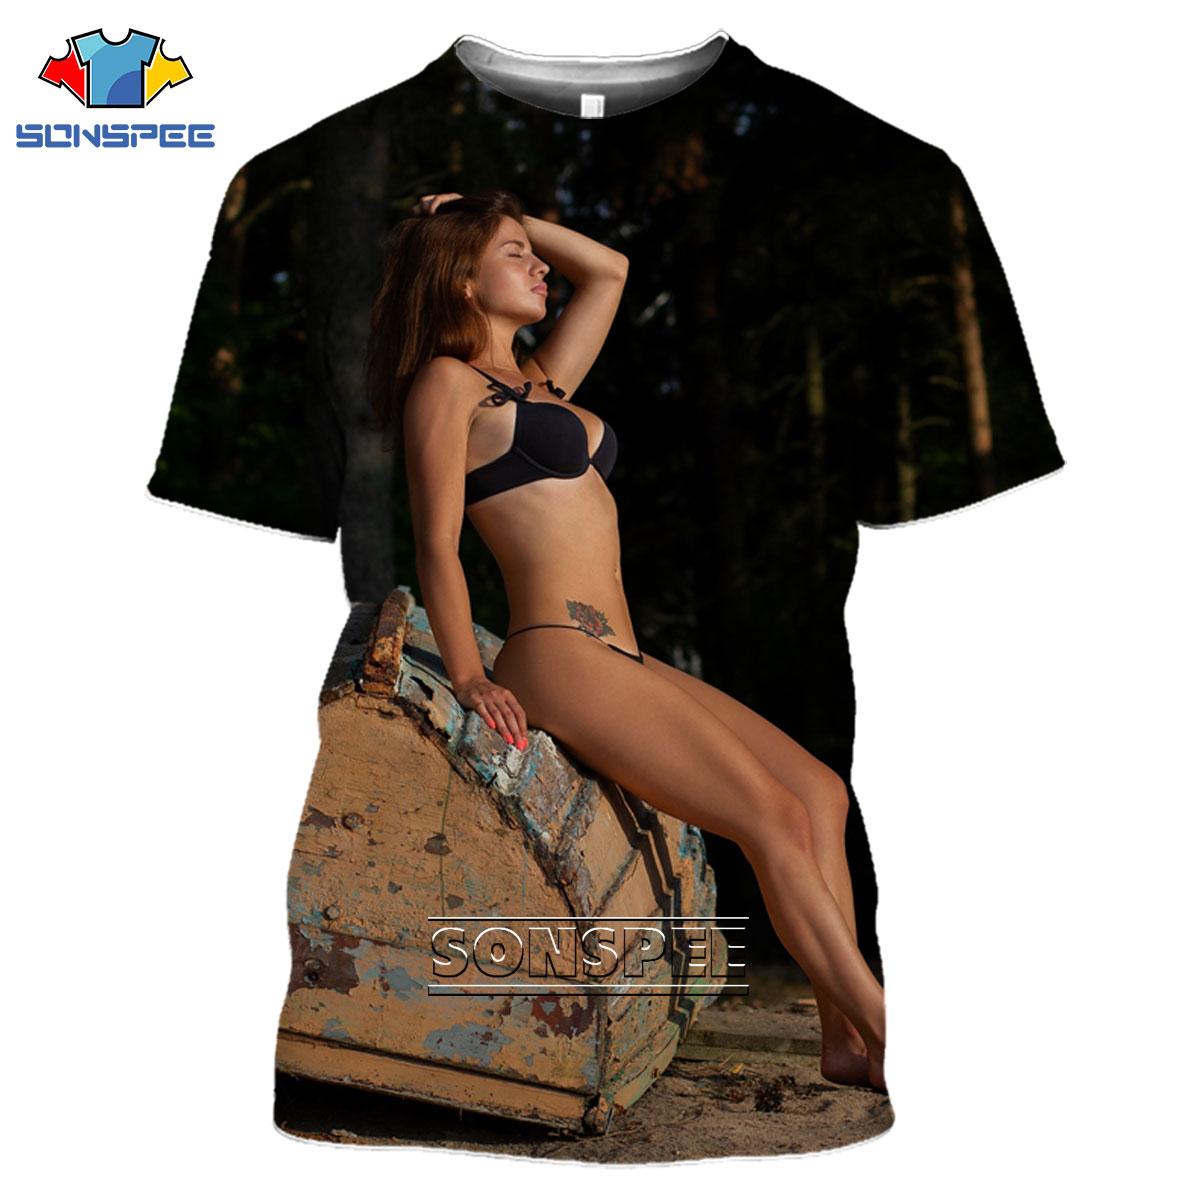 SONSPEE 3D Sexy Beauty Bikini Print T-shirt Summer Fitness Beach Otaku European And American Loose Printed Clothing